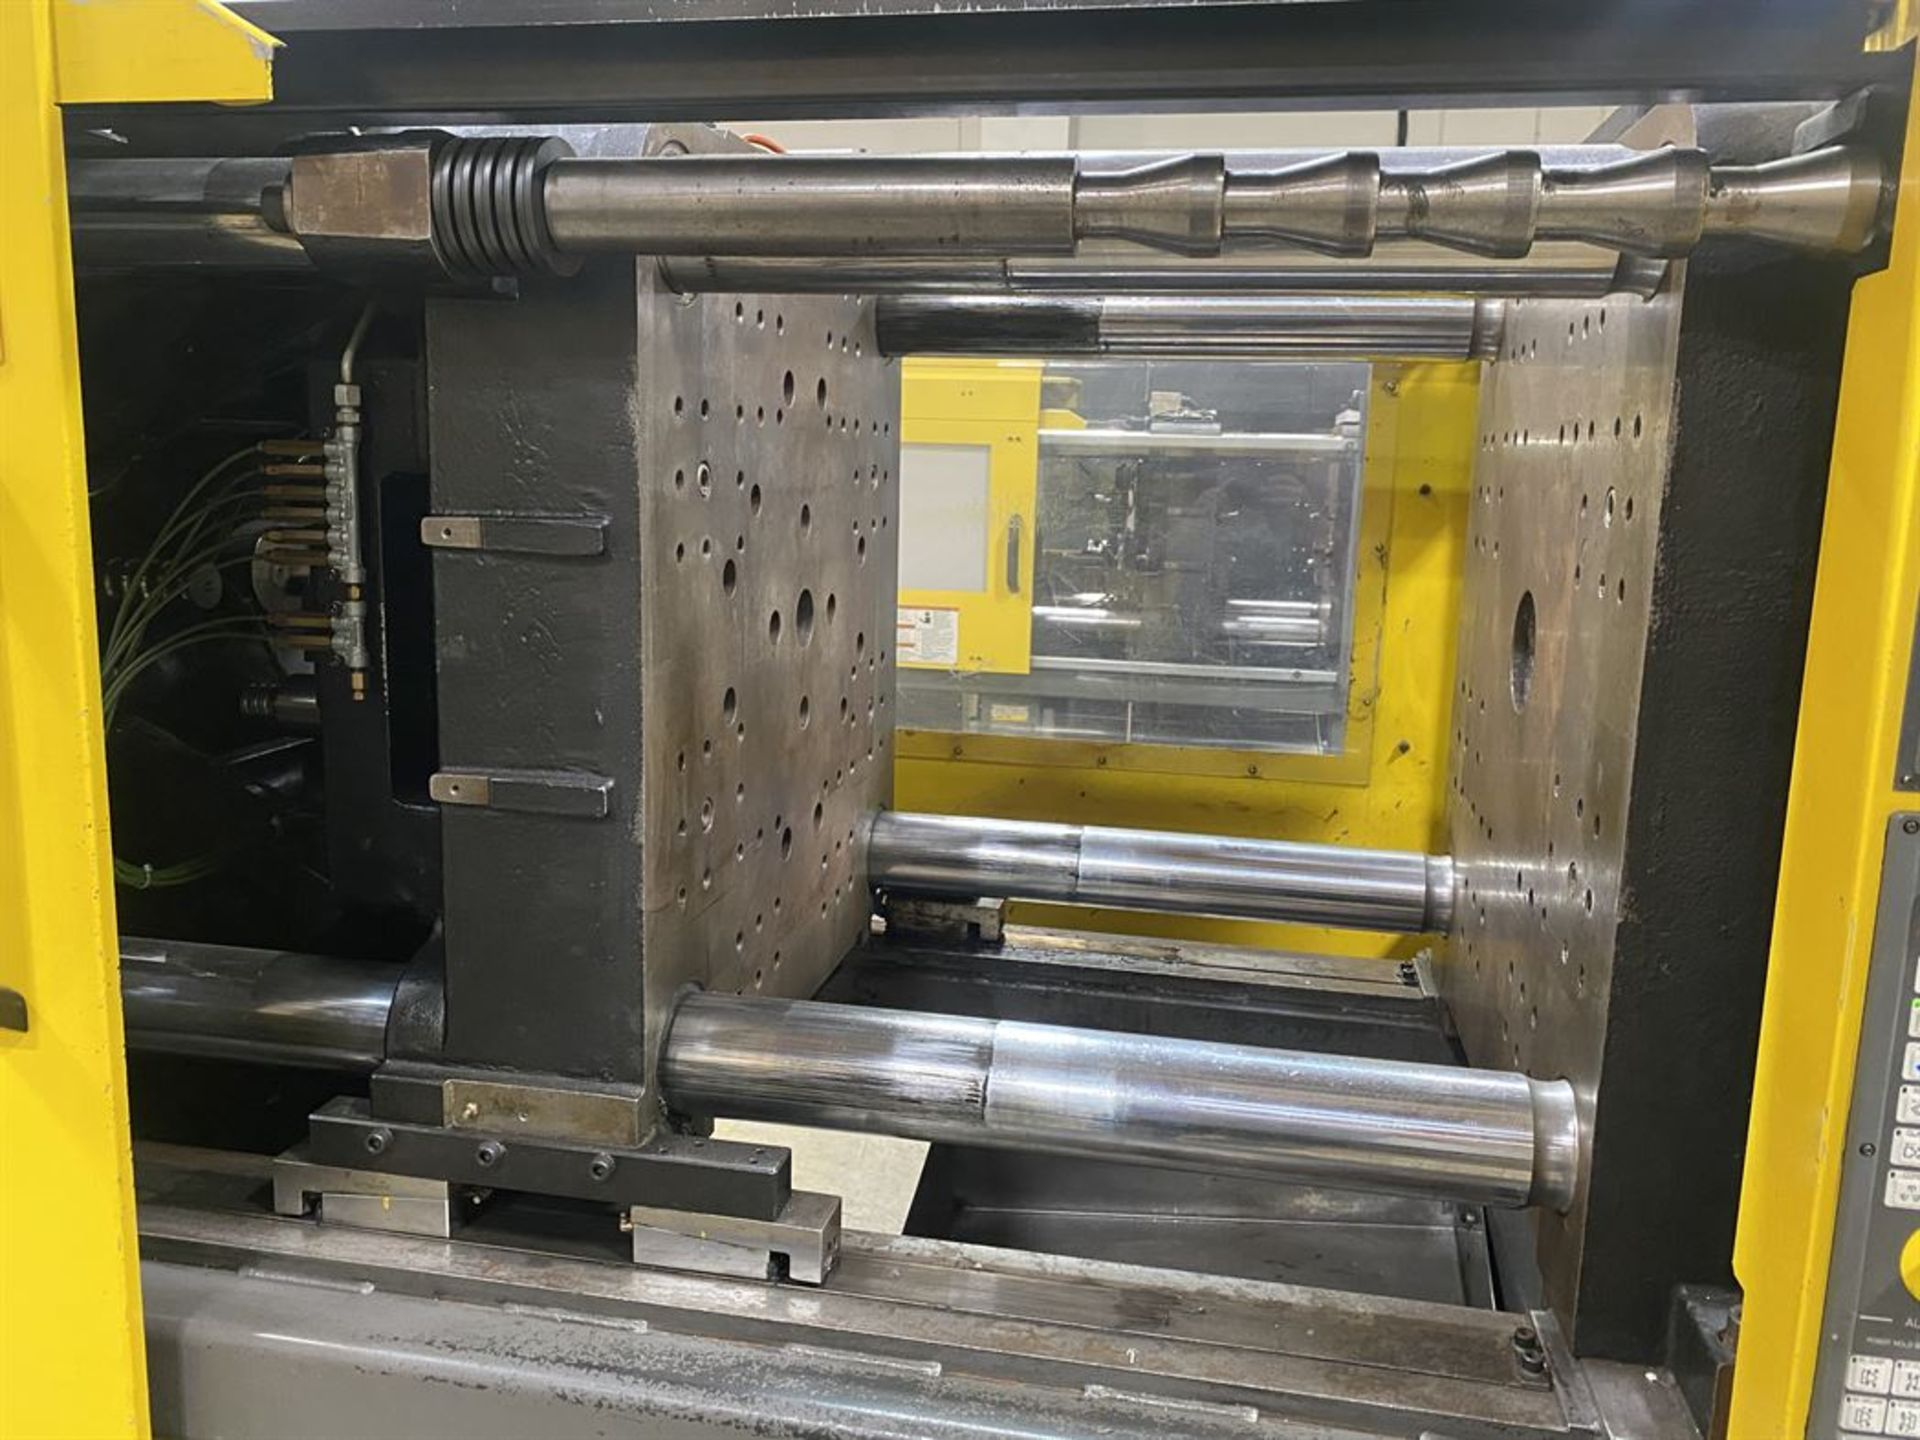 Lot 193 - CINCINNATI MILACRON FANUC RoboShot 165R-178 165 Ton Electric Injection Molders, s/n 4067A04/98-67,